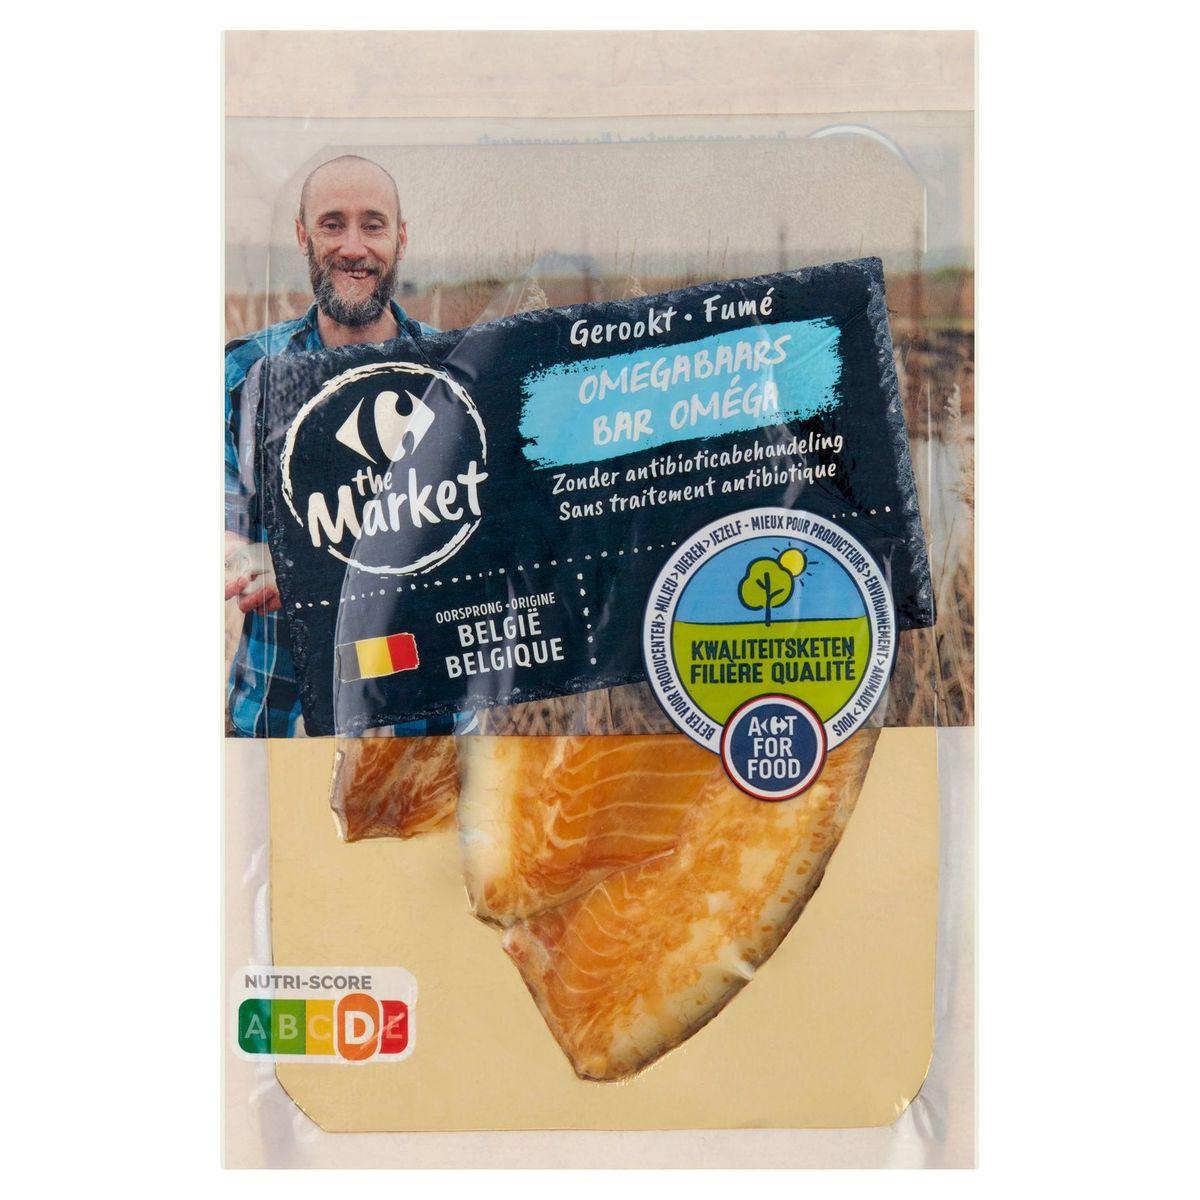 Carrefour Omegabaars Fumé FQC 110 g